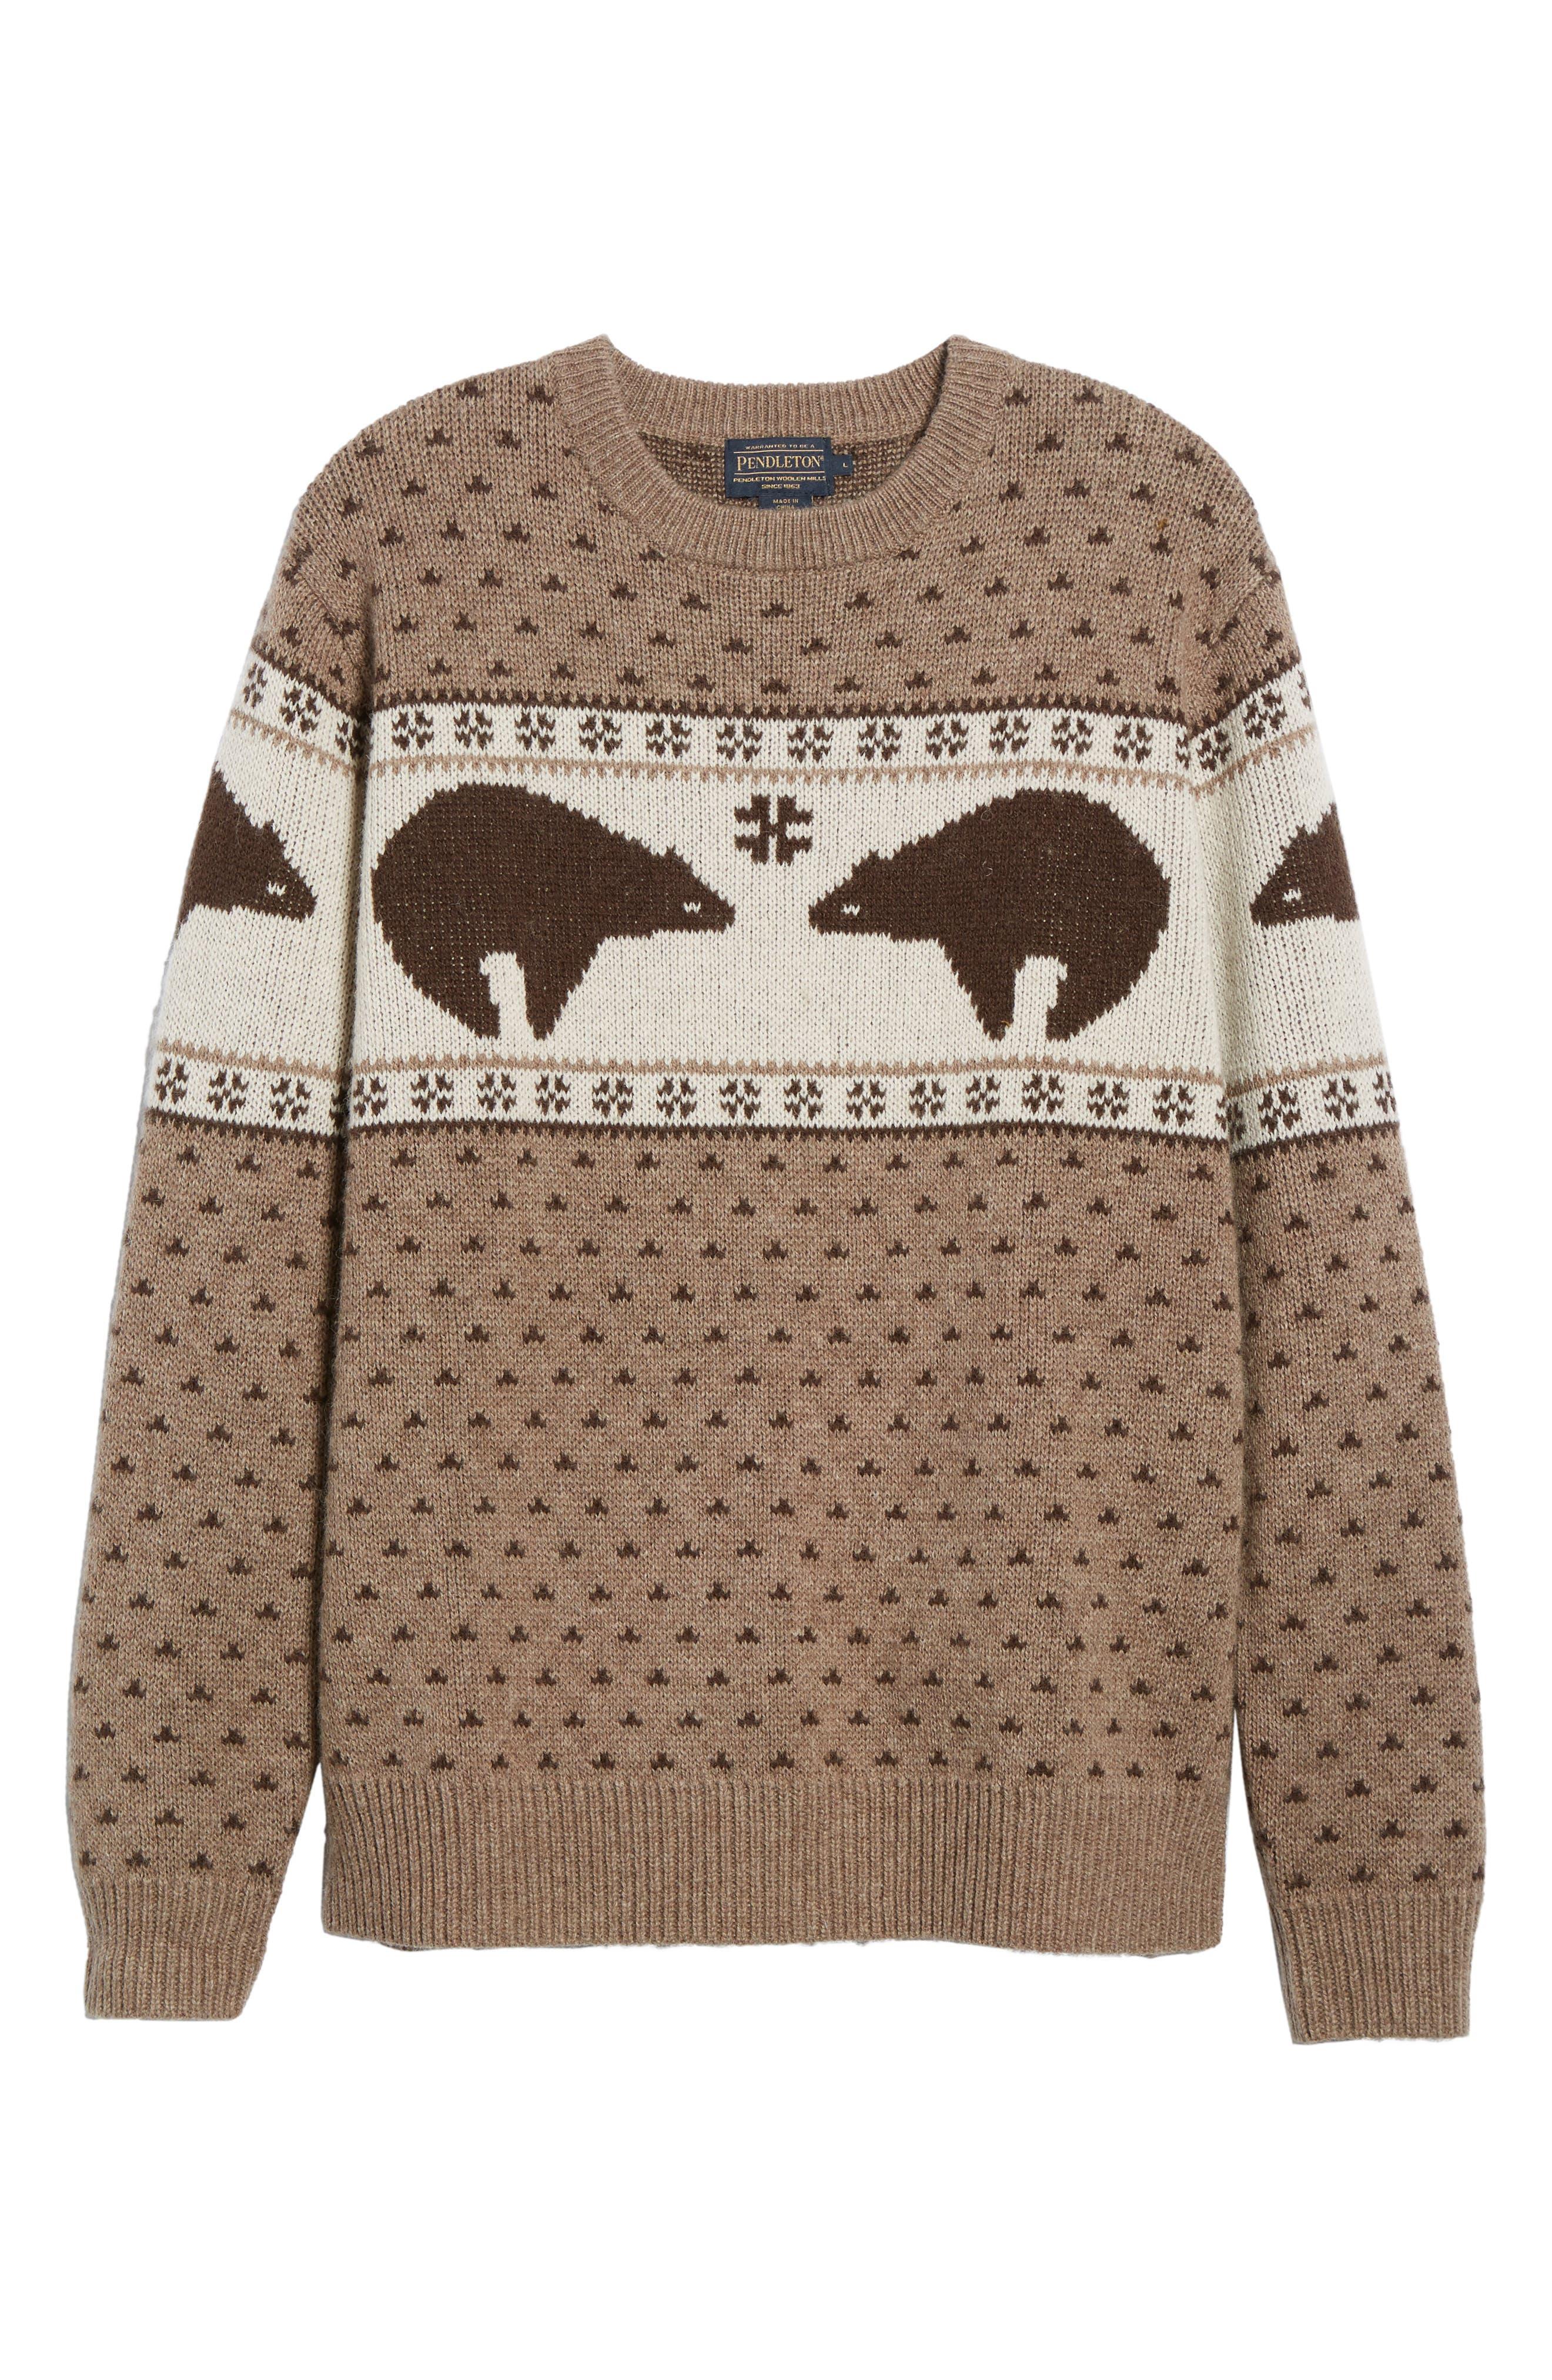 Bear Sweater,                             Alternate thumbnail 6, color,                             Brown/ Ivory Bear